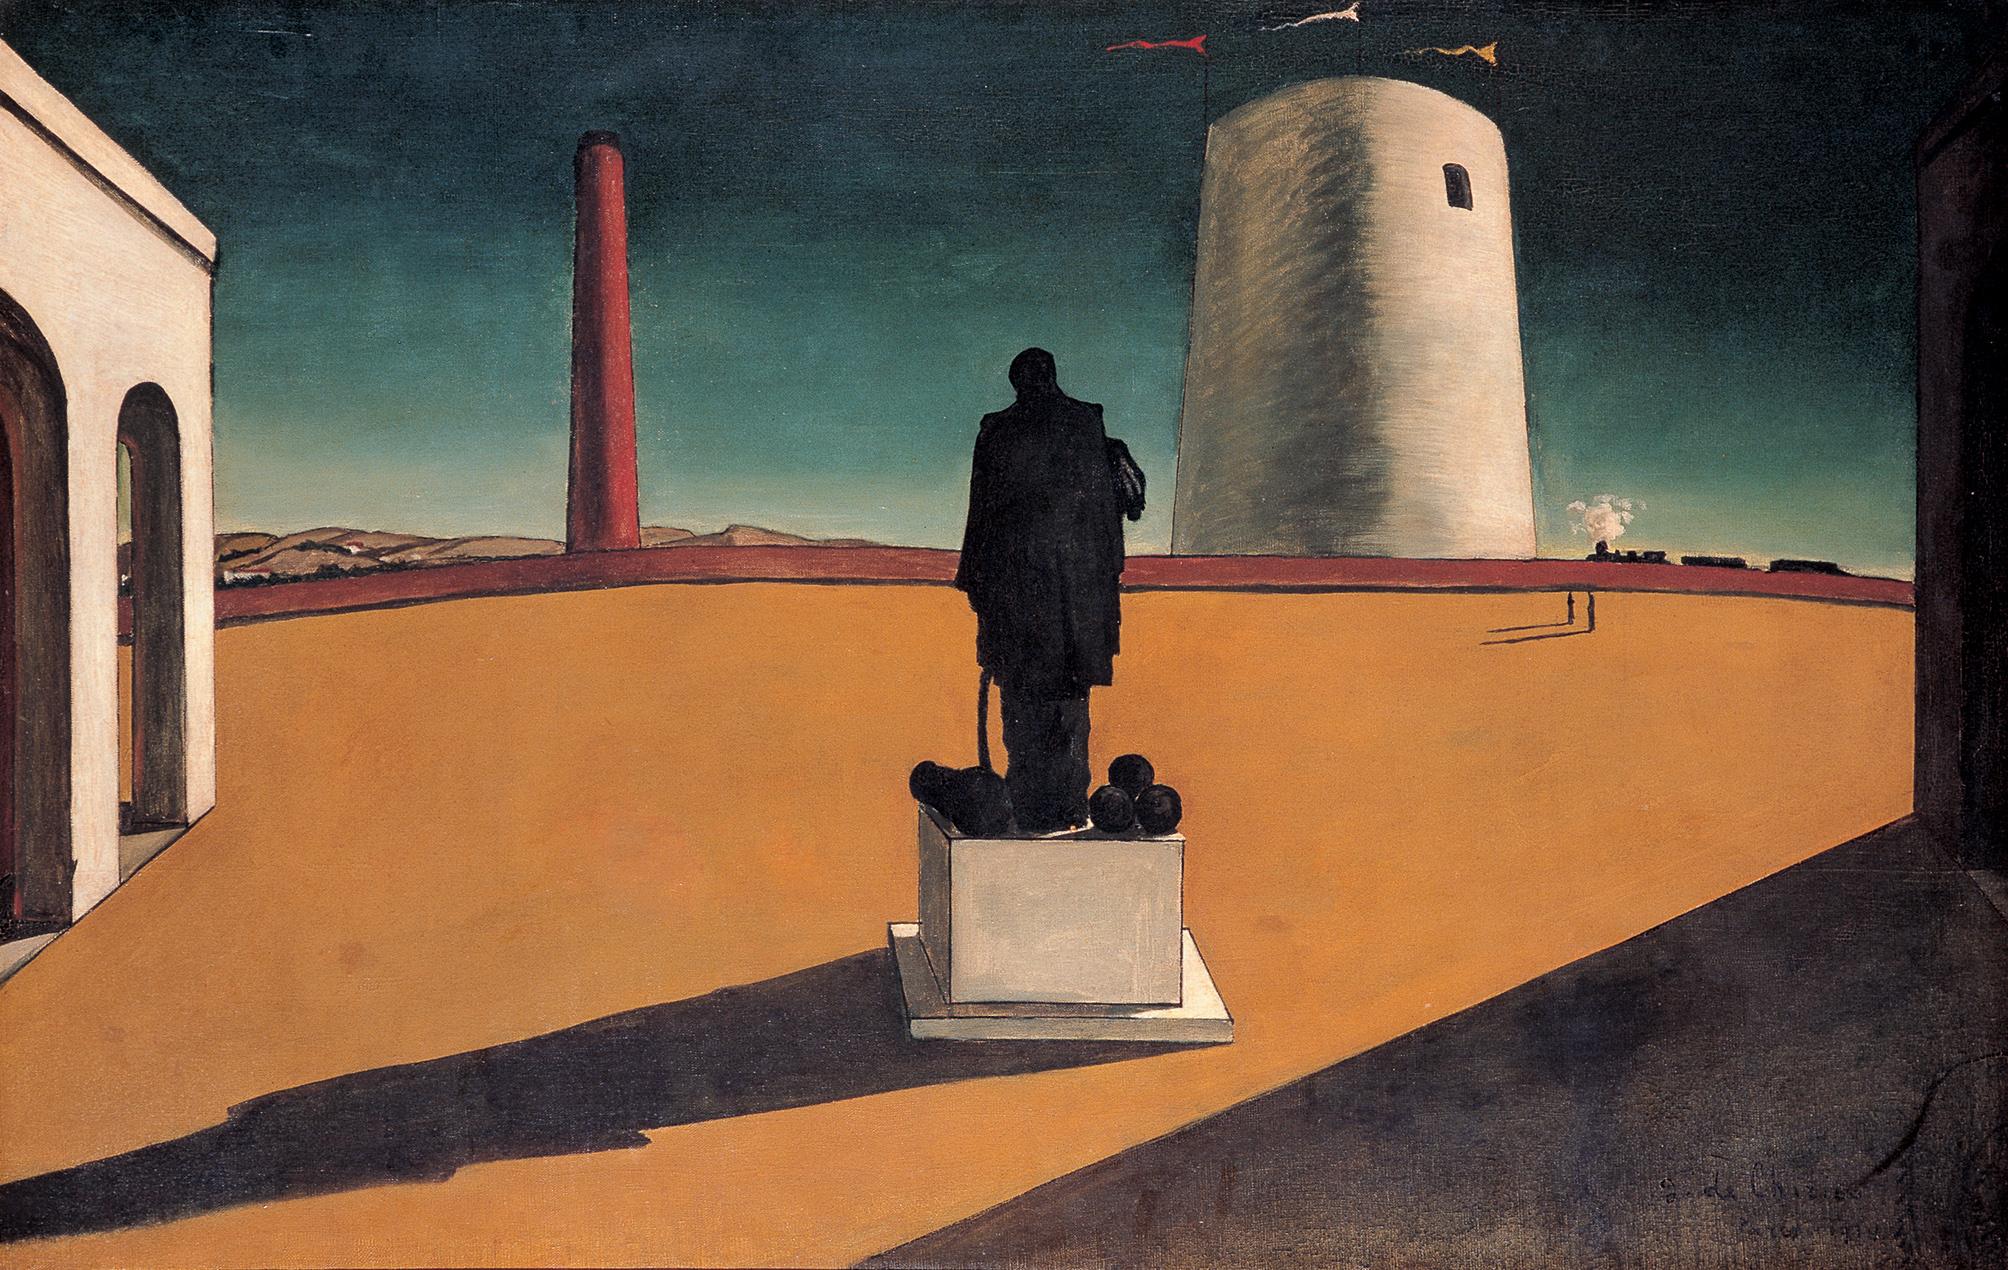 Giorgio de Chirico,L'enigma di una giornata, 1914, Olio su tela, Museu de Arte Contemporânea da Universidade de São Paulo, Brazil